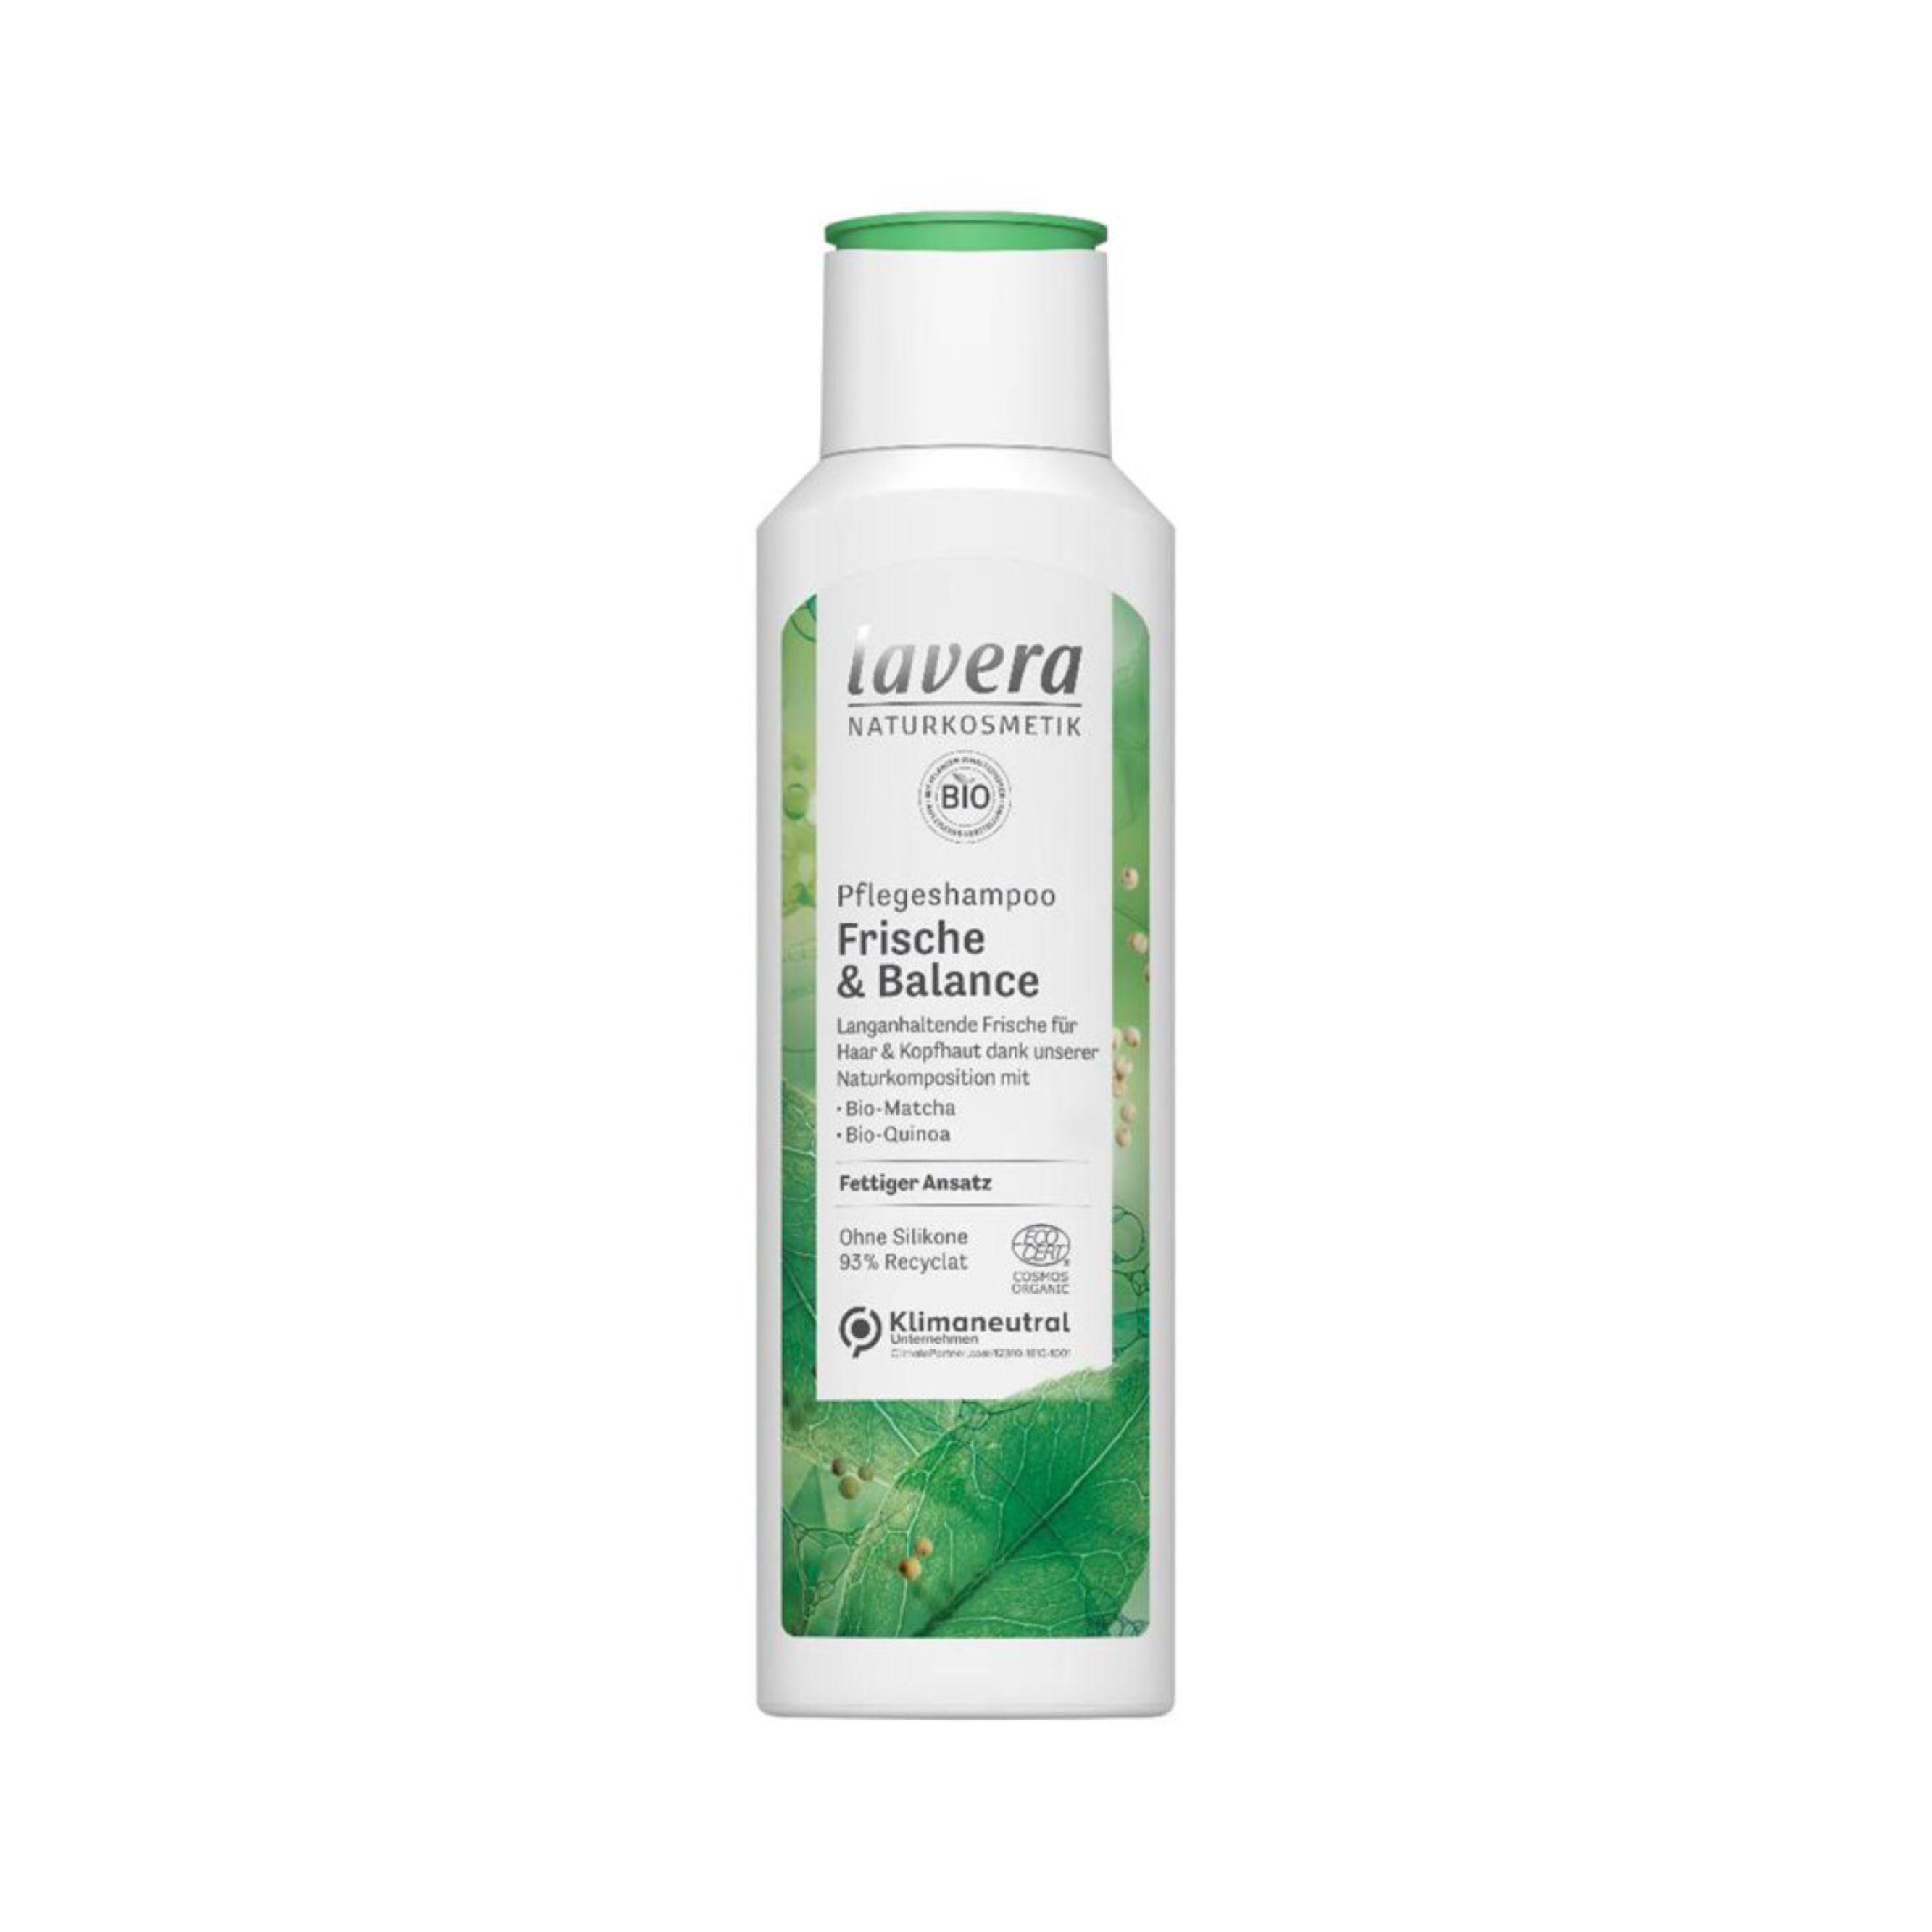 Šampón Frische & Balance 250 ml Lavera